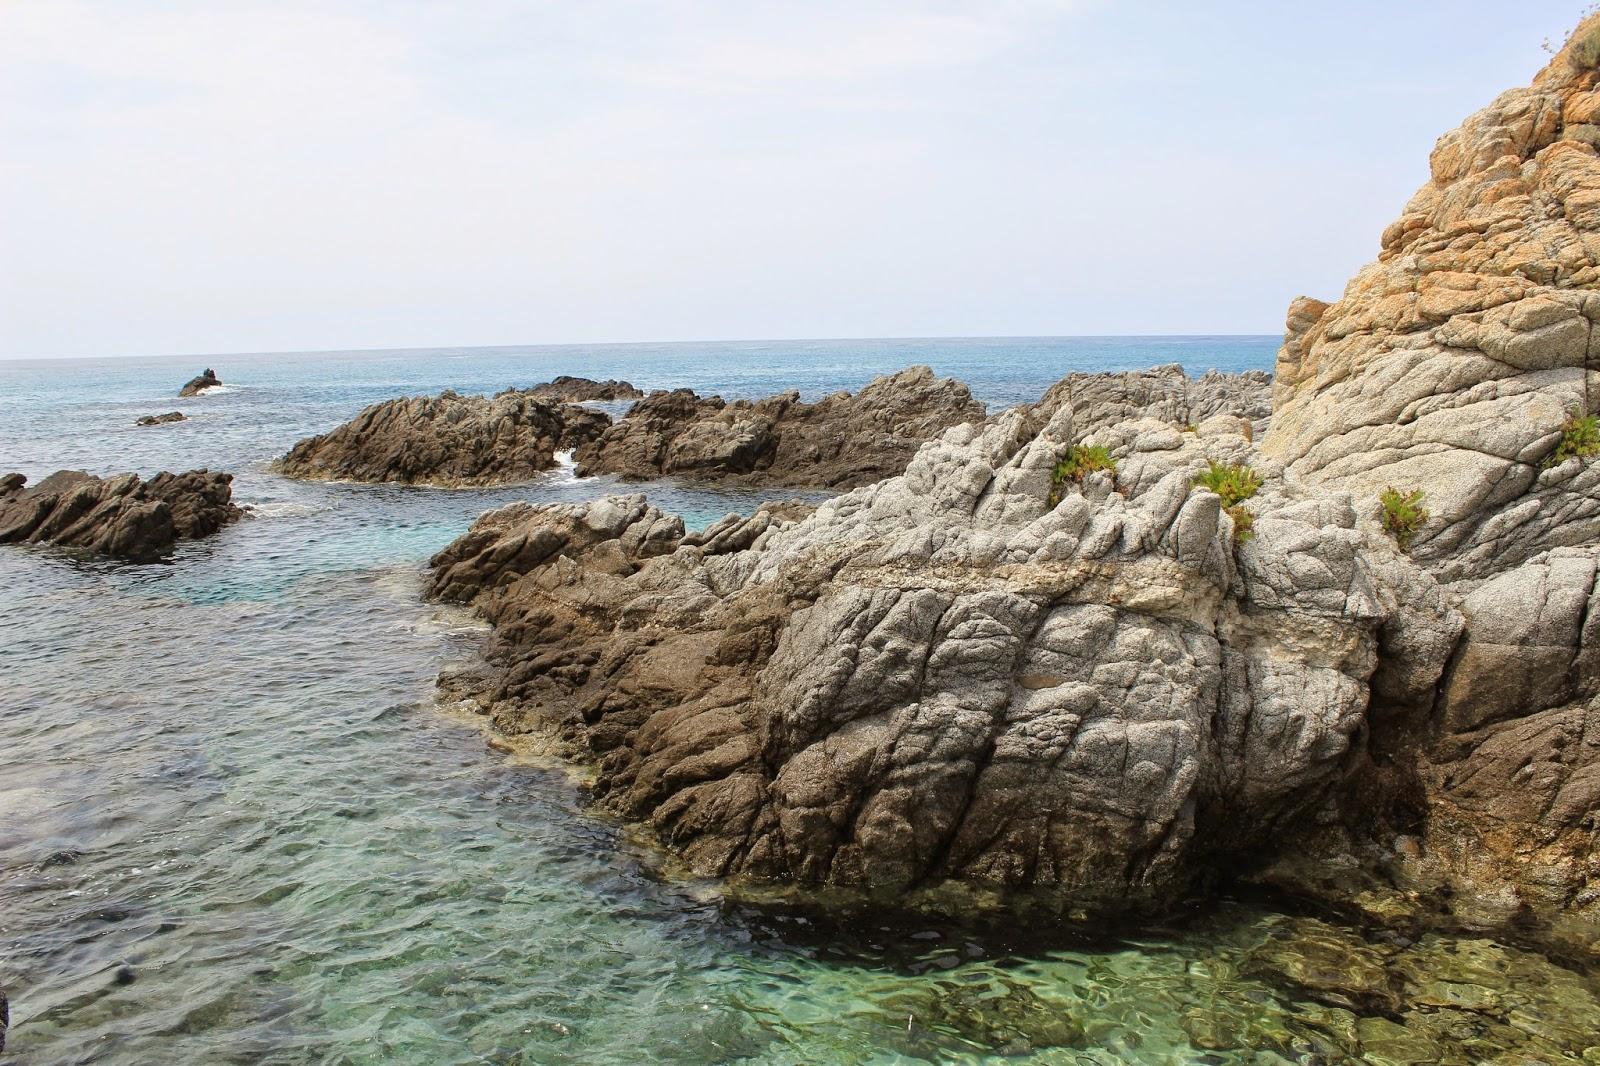 Plaża Grotticelle (Capo Vaticano), Kalabria, Włochy